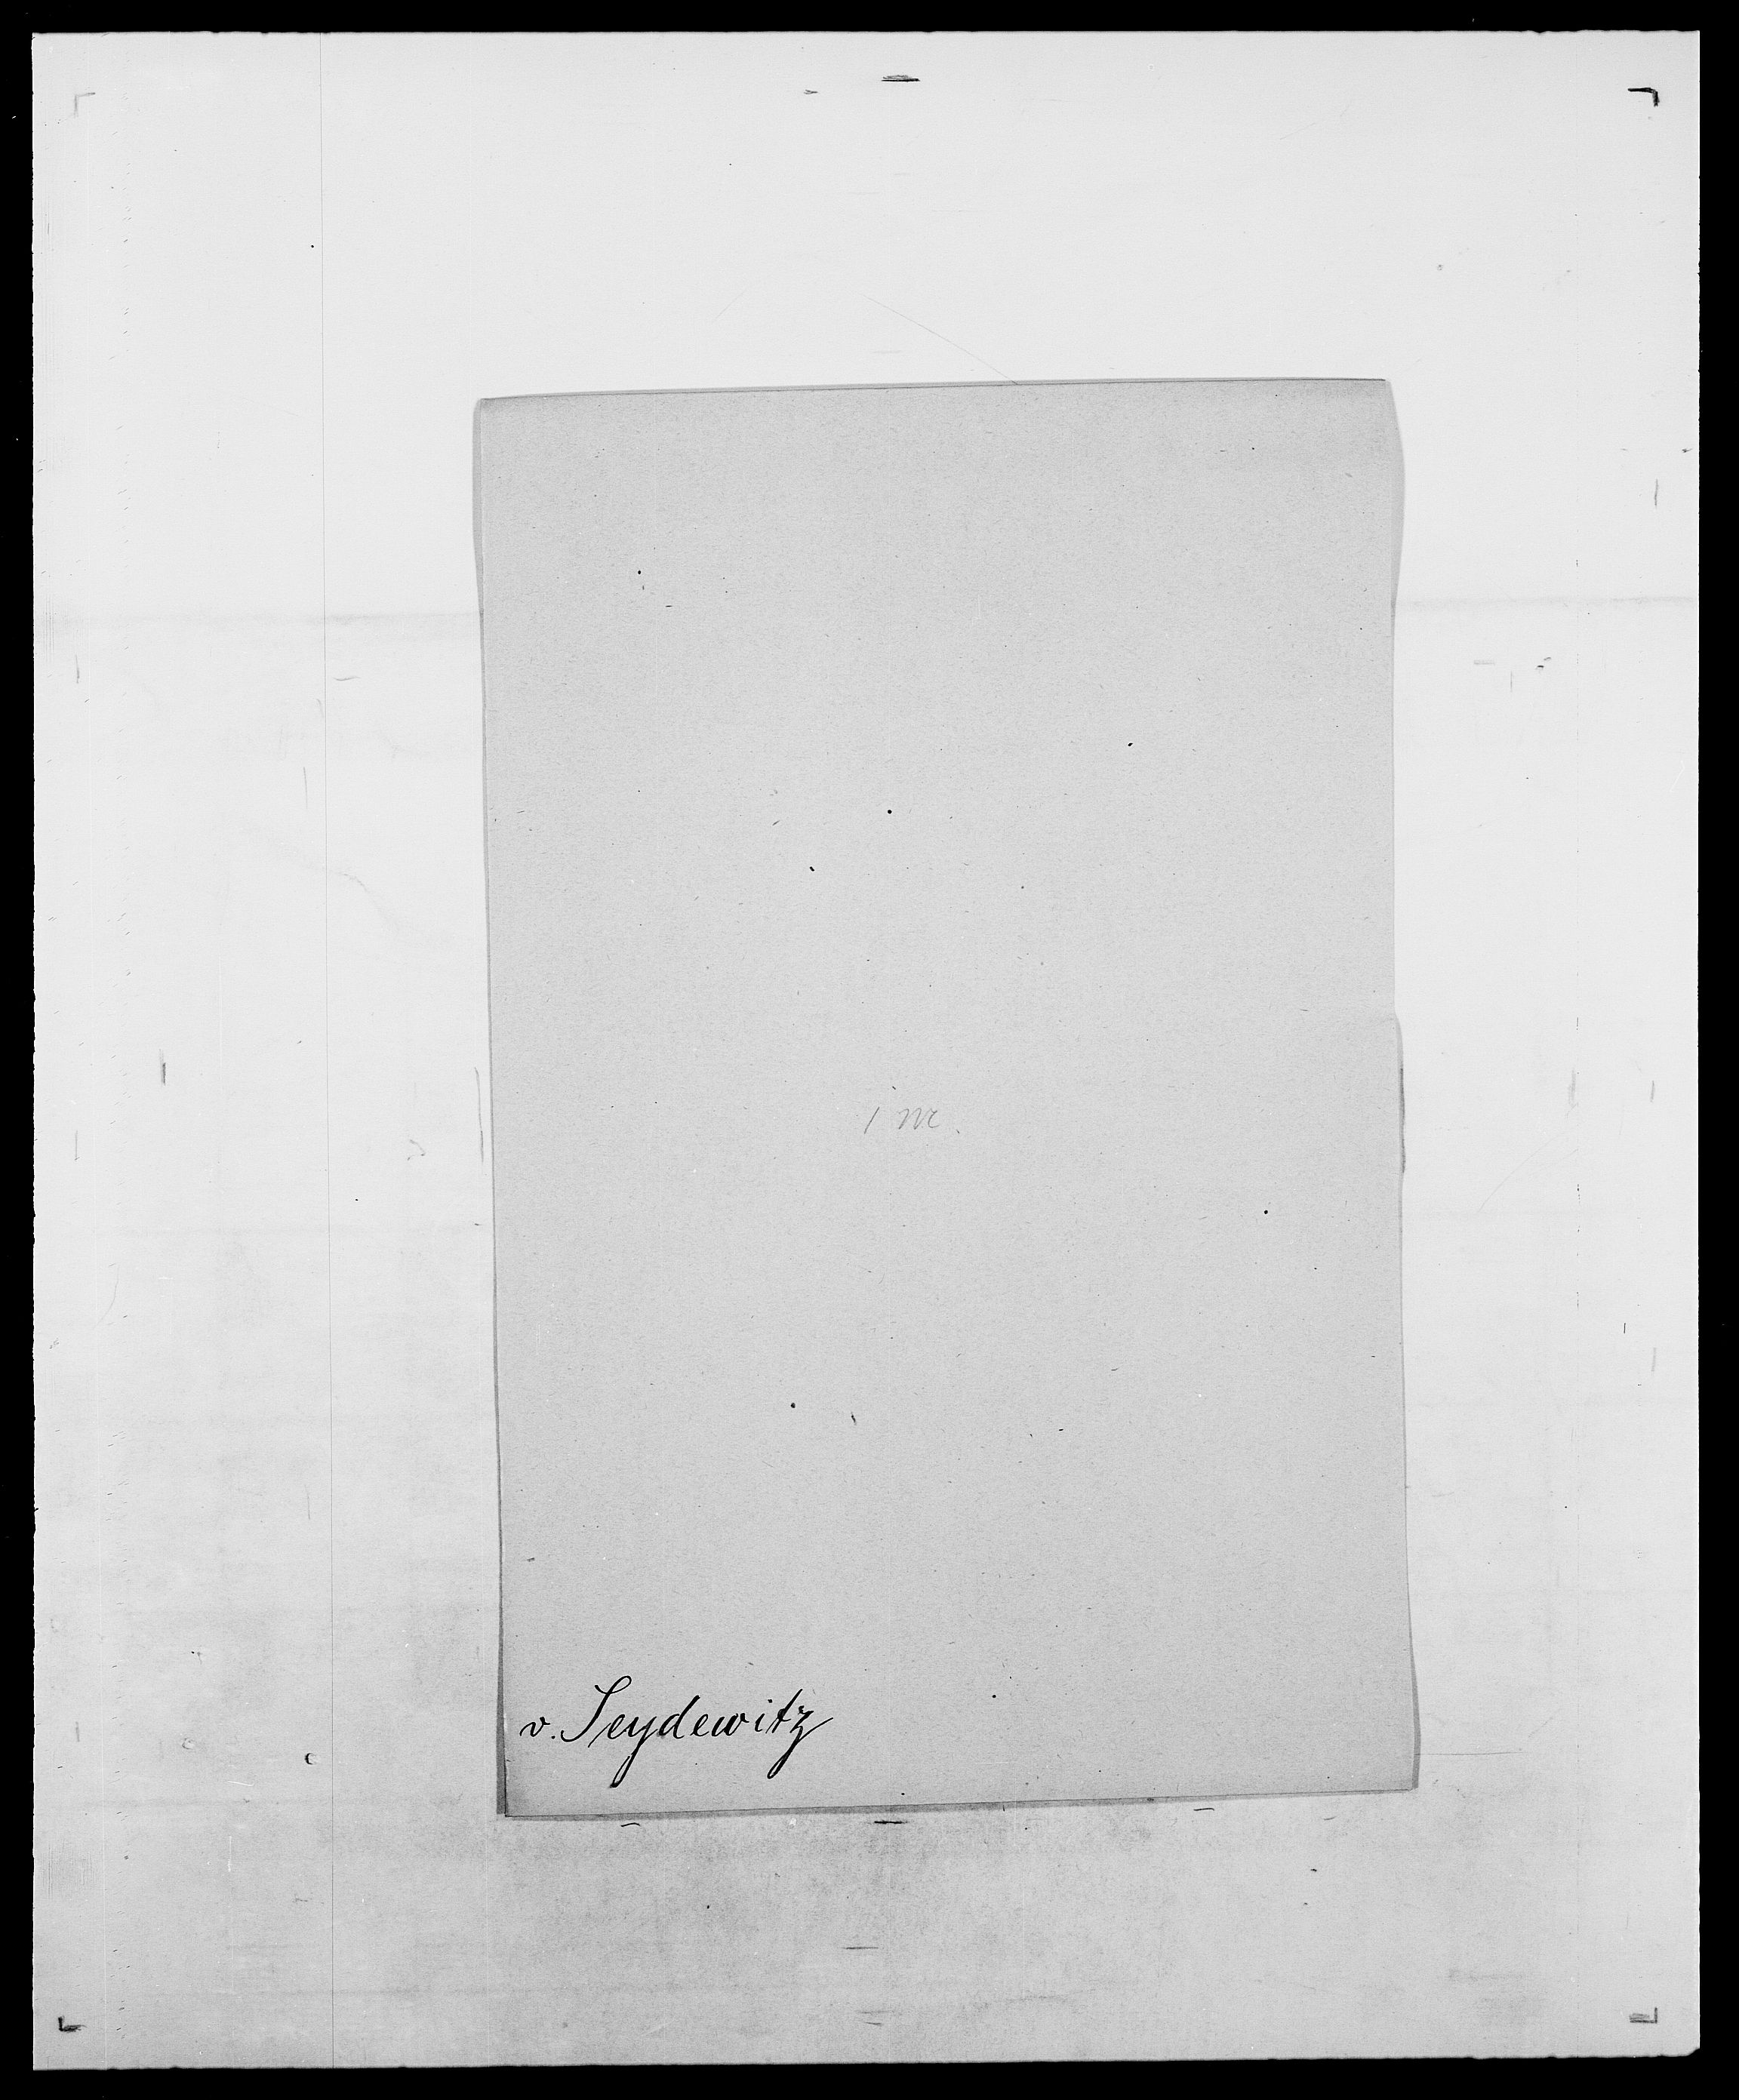 SAO, Delgobe, Charles Antoine - samling, D/Da/L0035: Schnabel - sjetman, s. 745